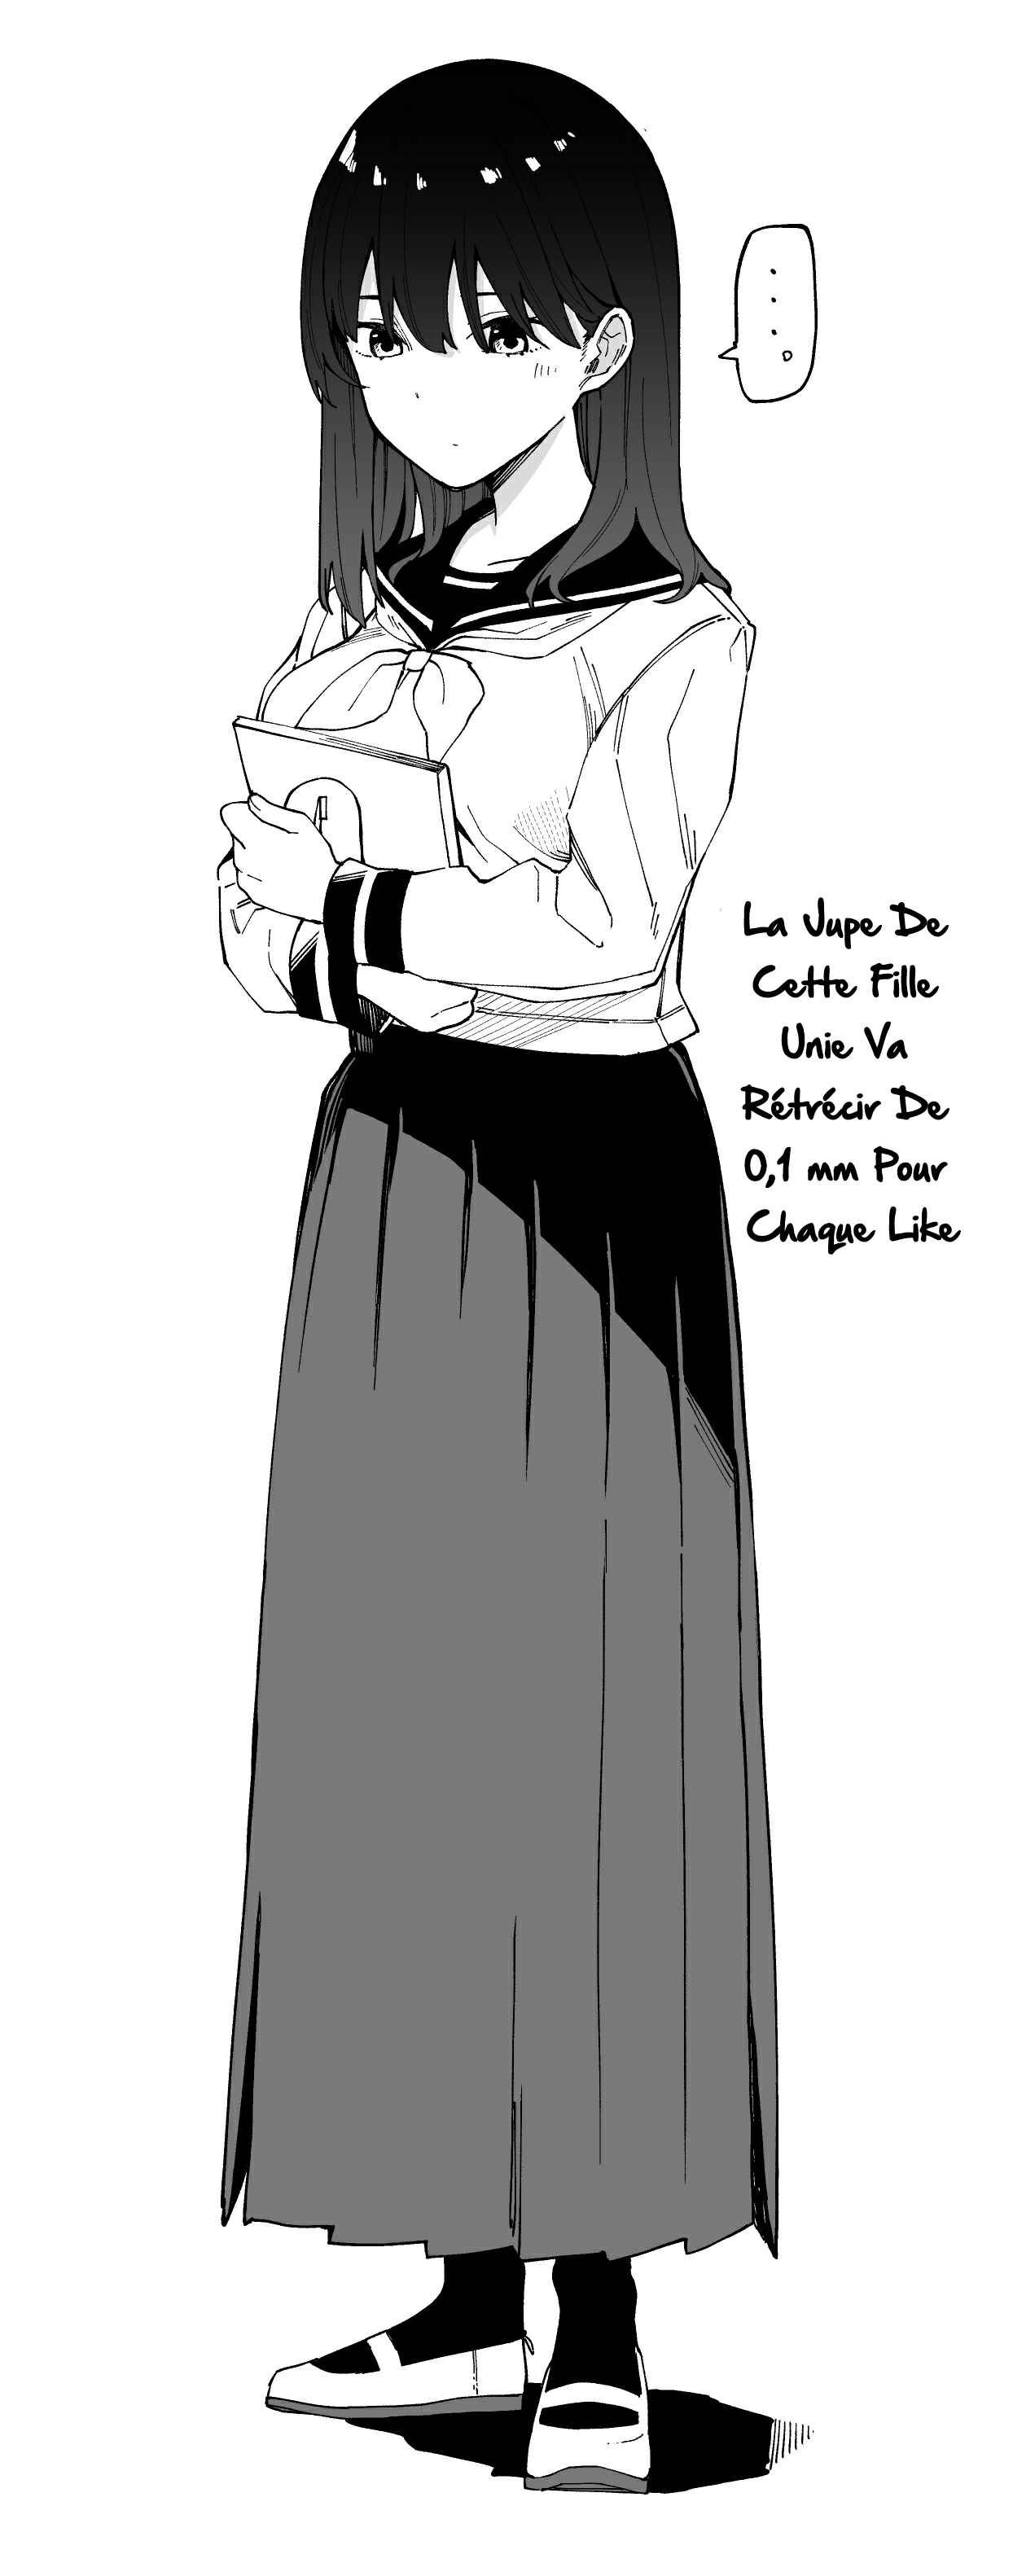 https://nine.mangadogs.com/fr_manga/pic2/60/13628/560276/4989386aaa0e680e85a7bb0d51fa826c.jpg Page 1